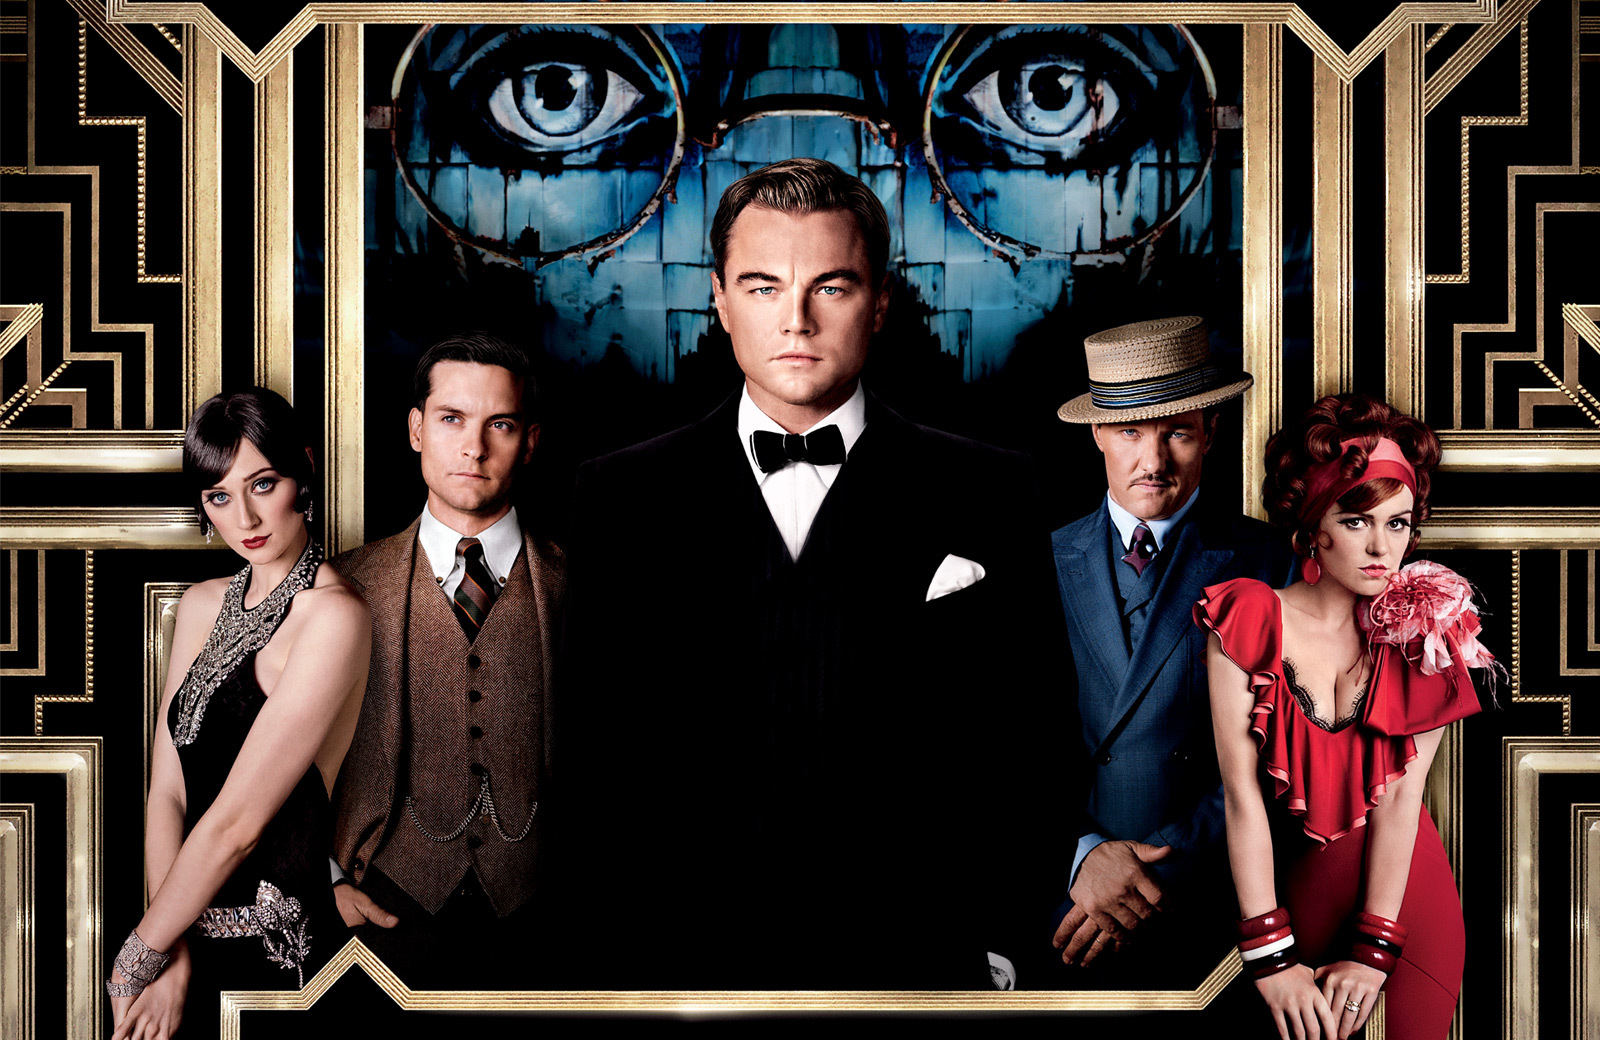 20480 download wallpaper Cinema, People, Actors, Men, Leonardo Dicaprio screensavers and pictures for free